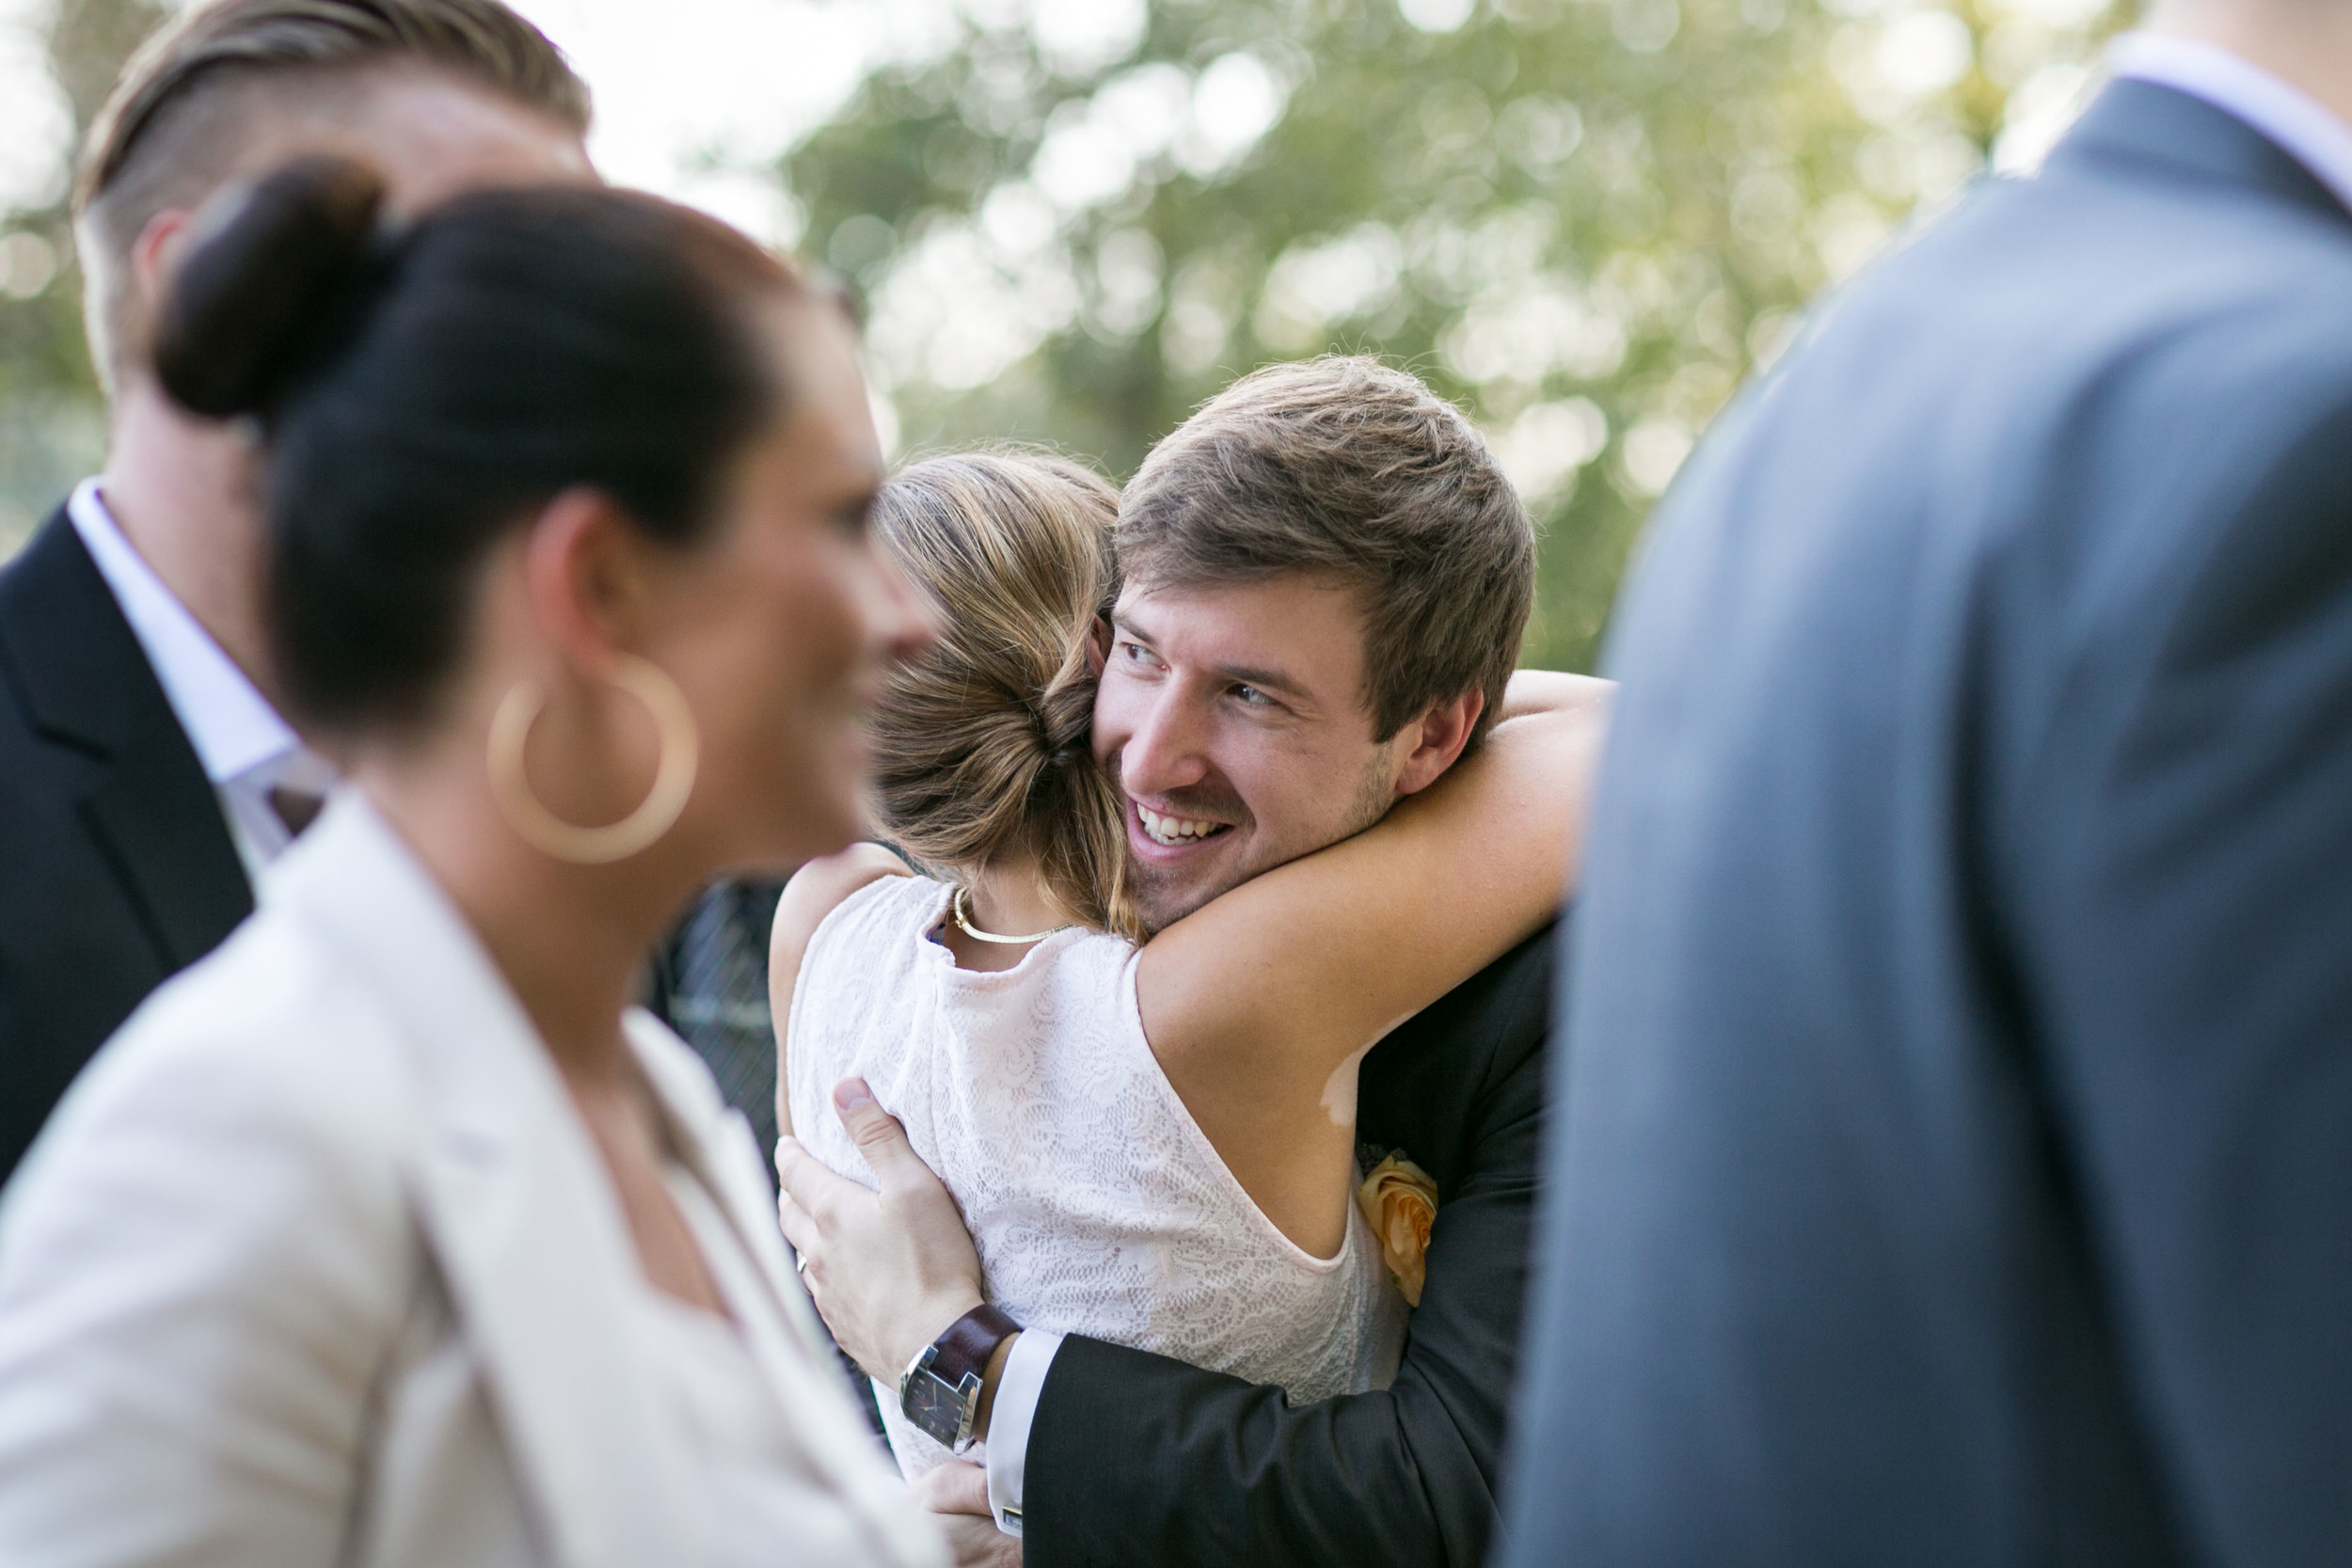 Fran Burrows Hochzeitsfotografie_Kulturgut Wrechen Hochzeit-23.jpg